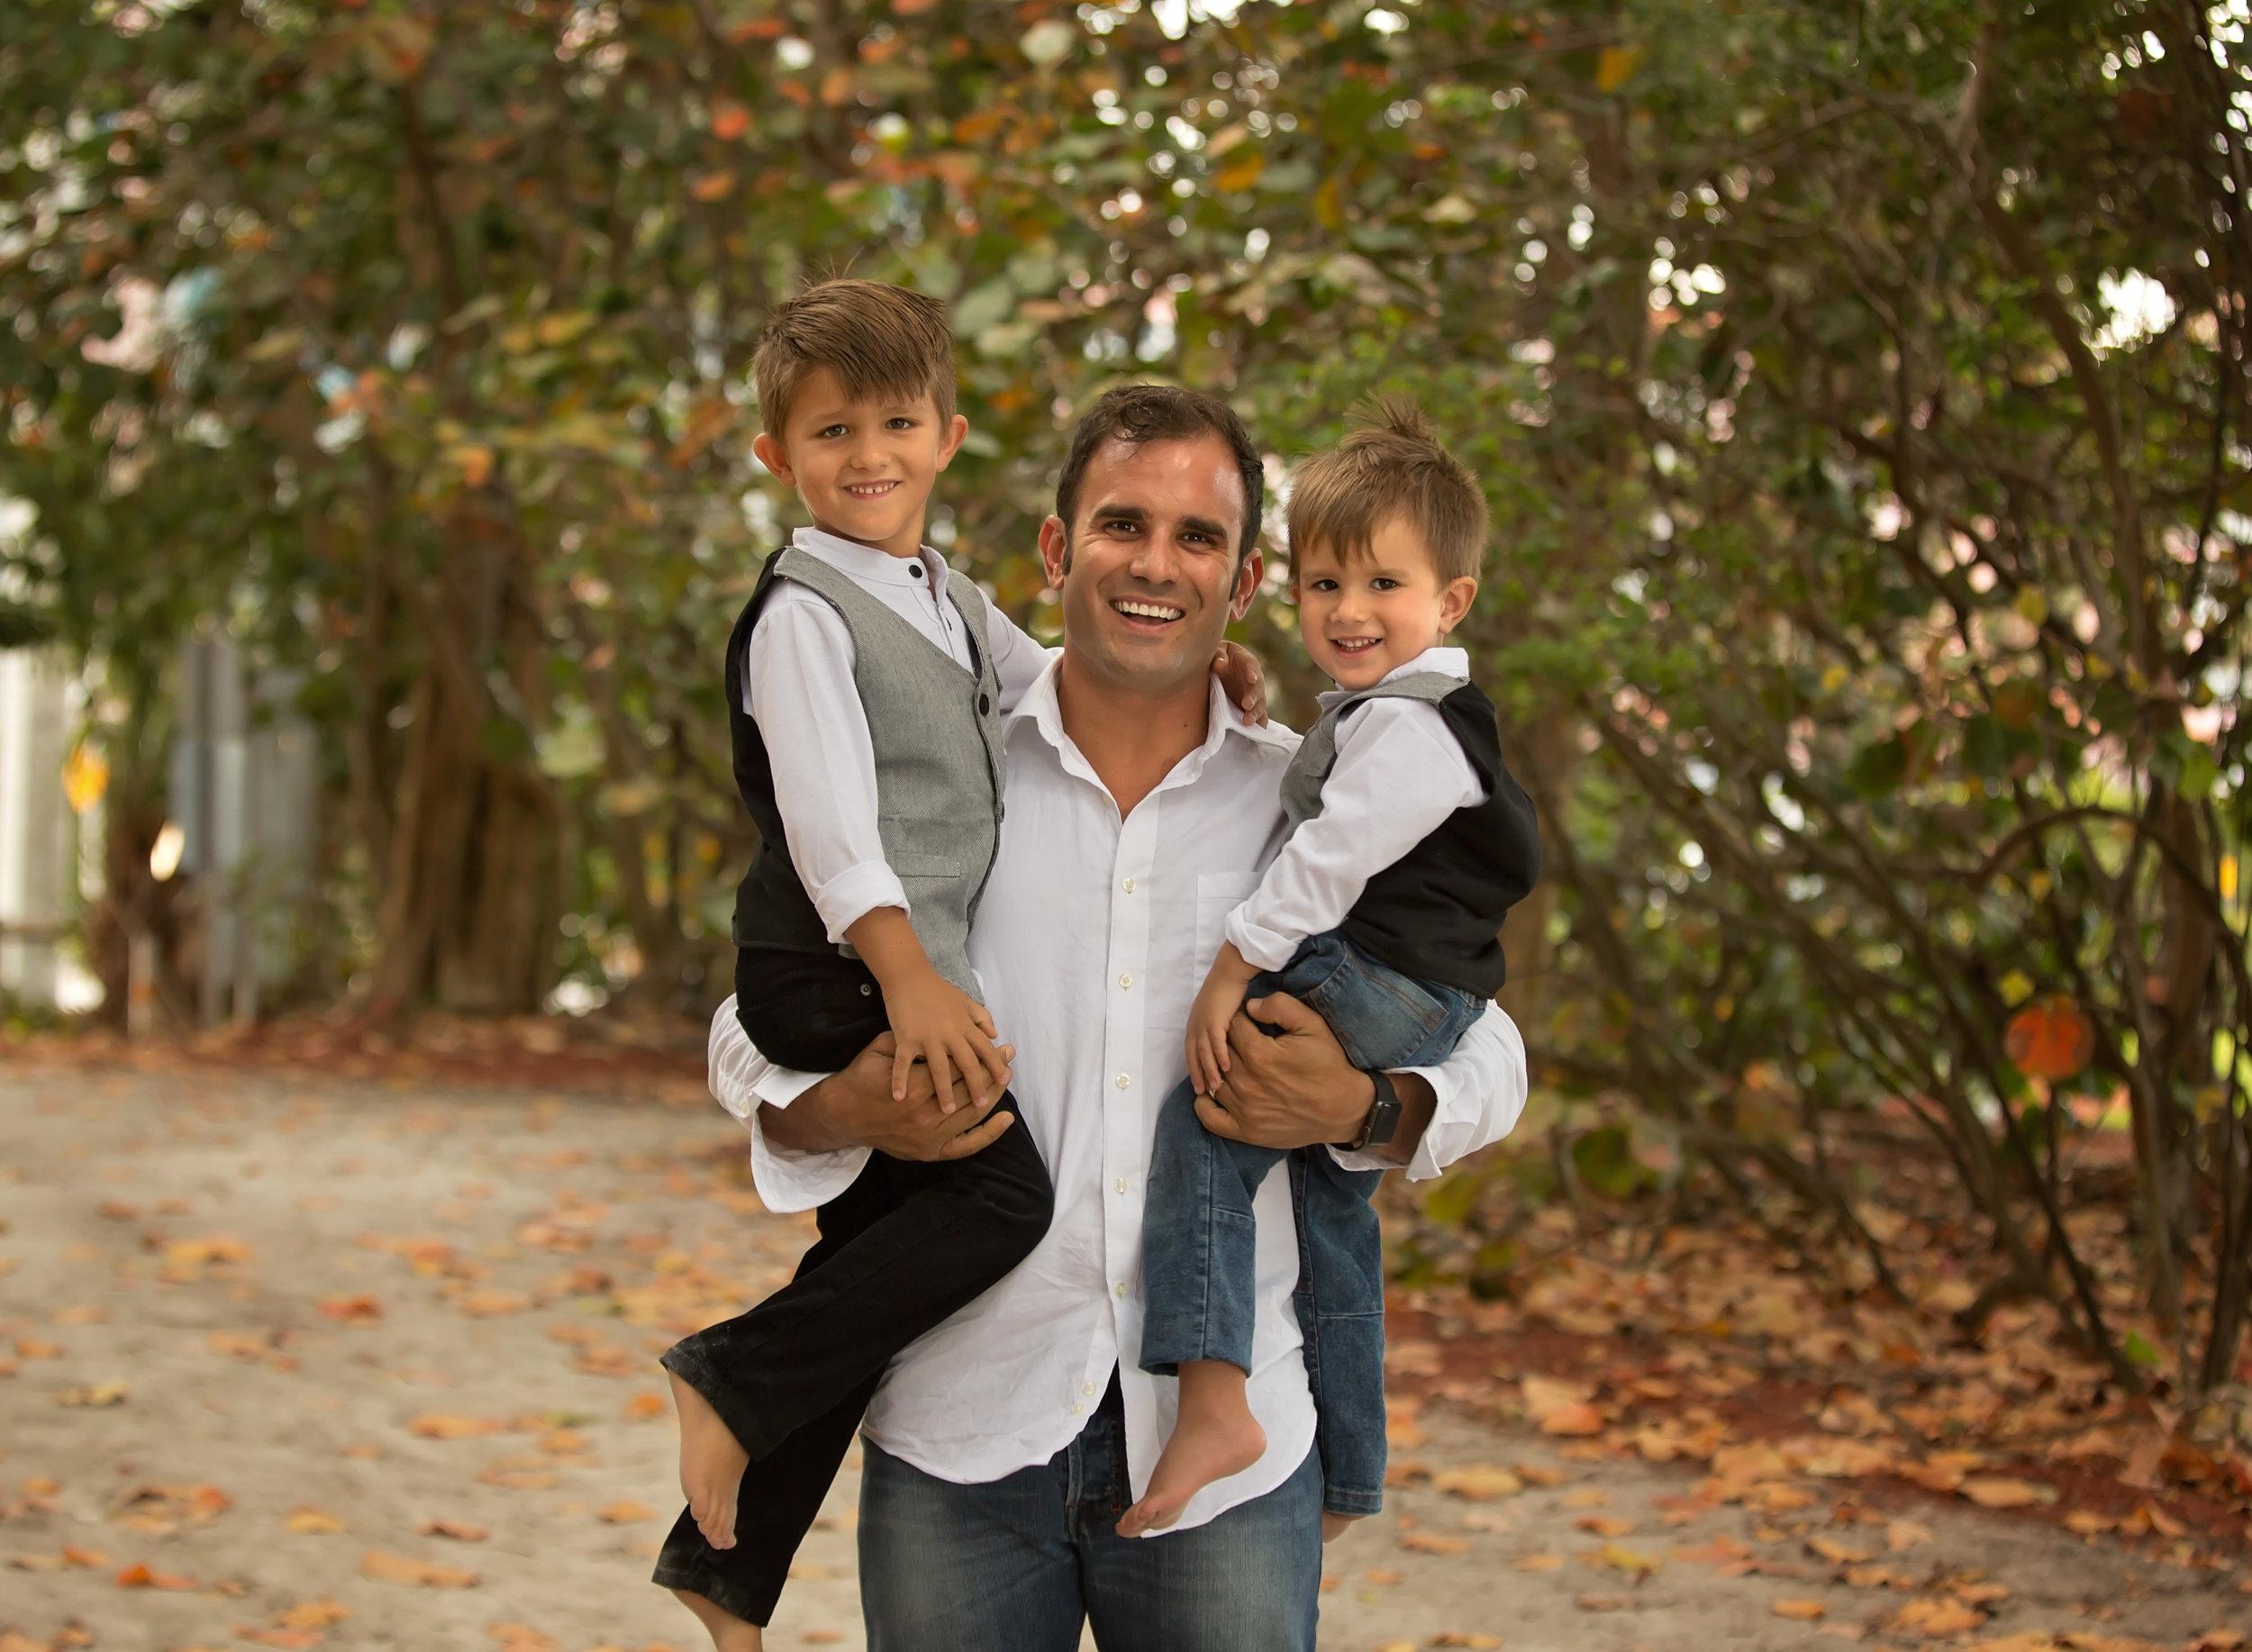 boca-raton-child-photographer-parkland-family-photographer-coral-springs-wellington-lake-worth-boynton-lantana-alissa-delucca-photography-dad-and-sons.jpg